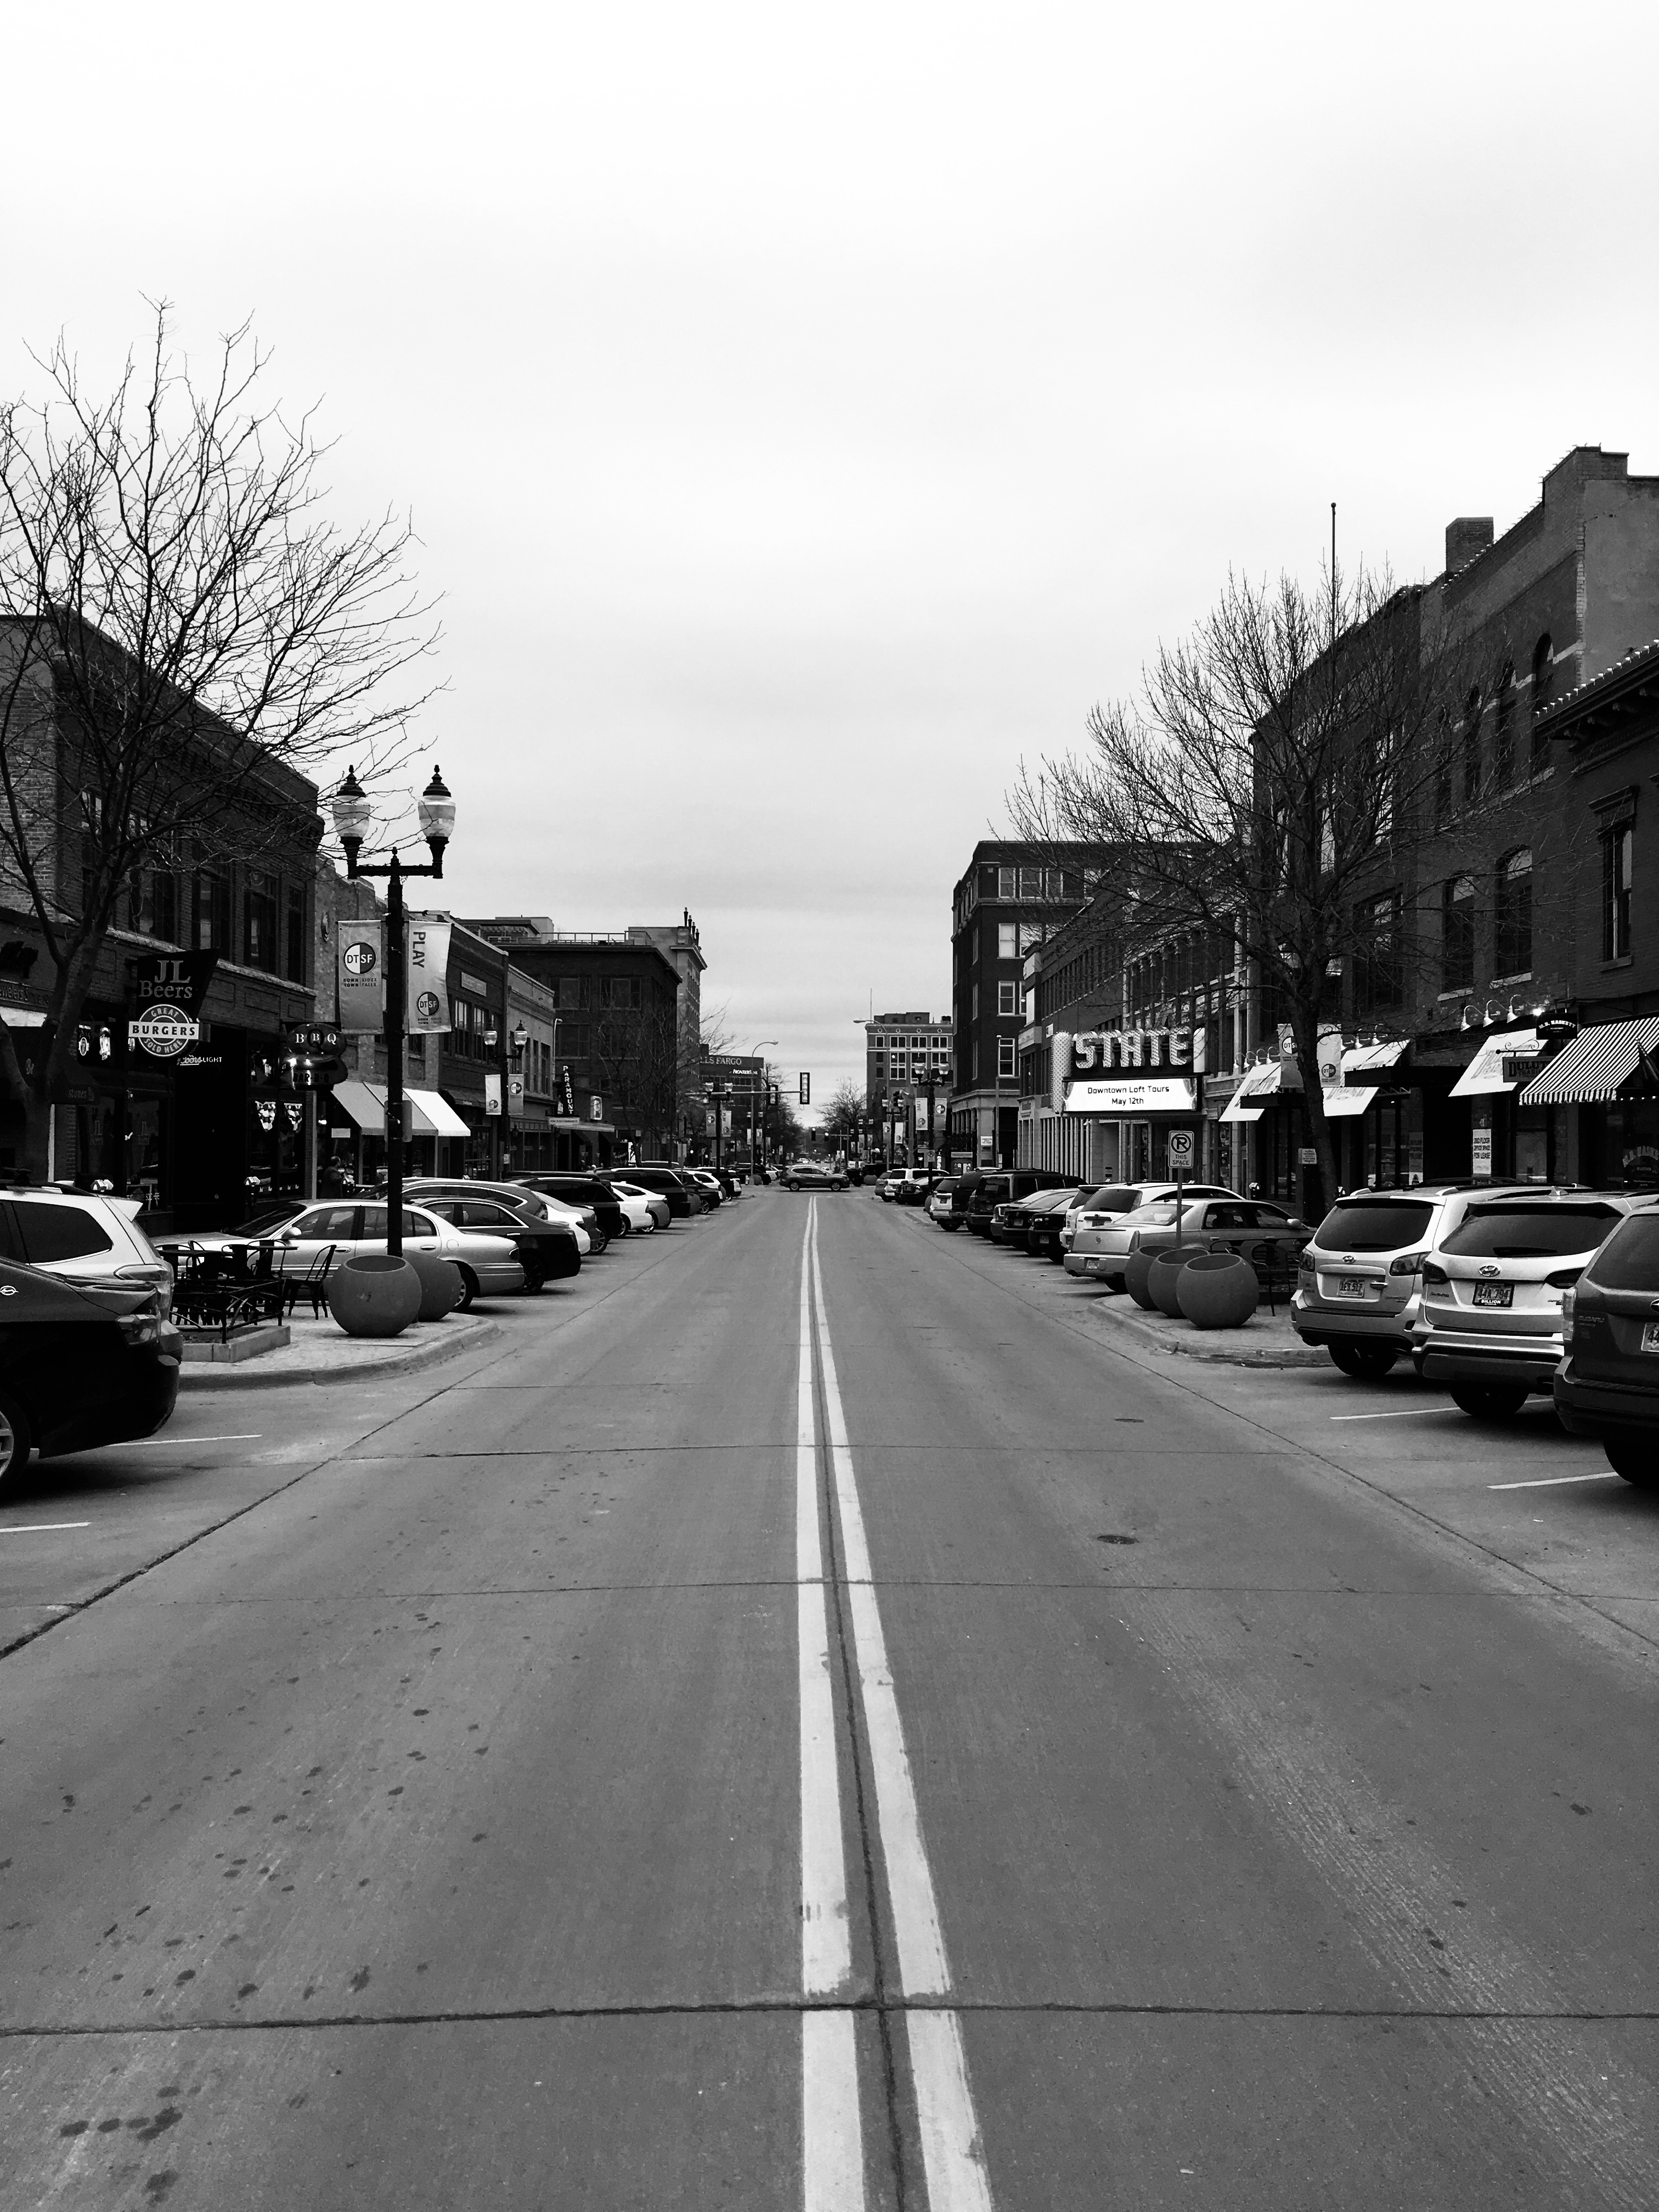 A view down main street in Sioux Falls.